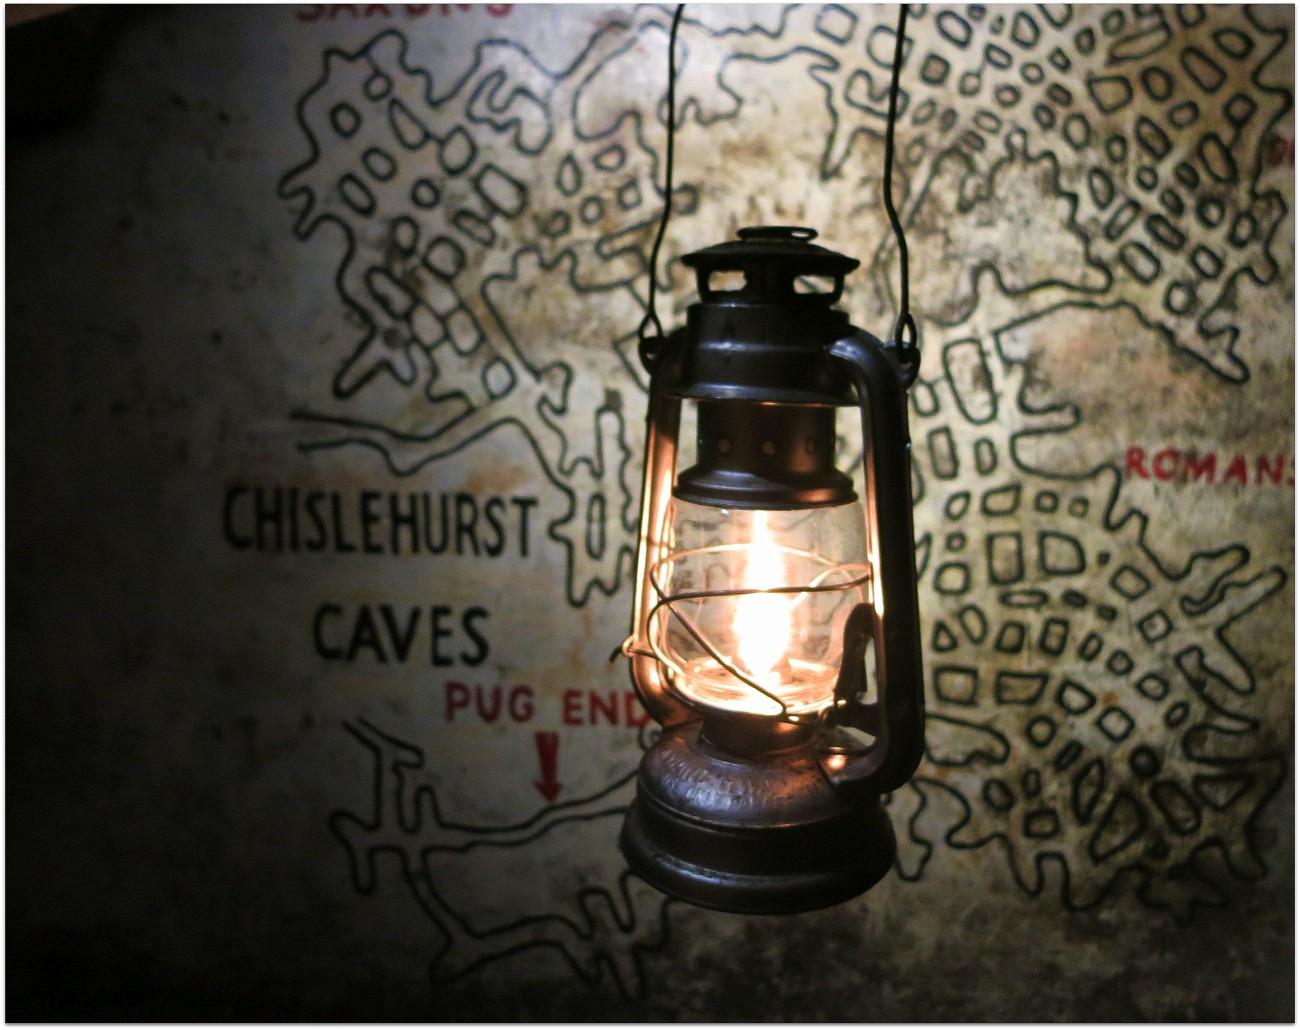 Resultado de imagen de Las cuevas Chislehurst